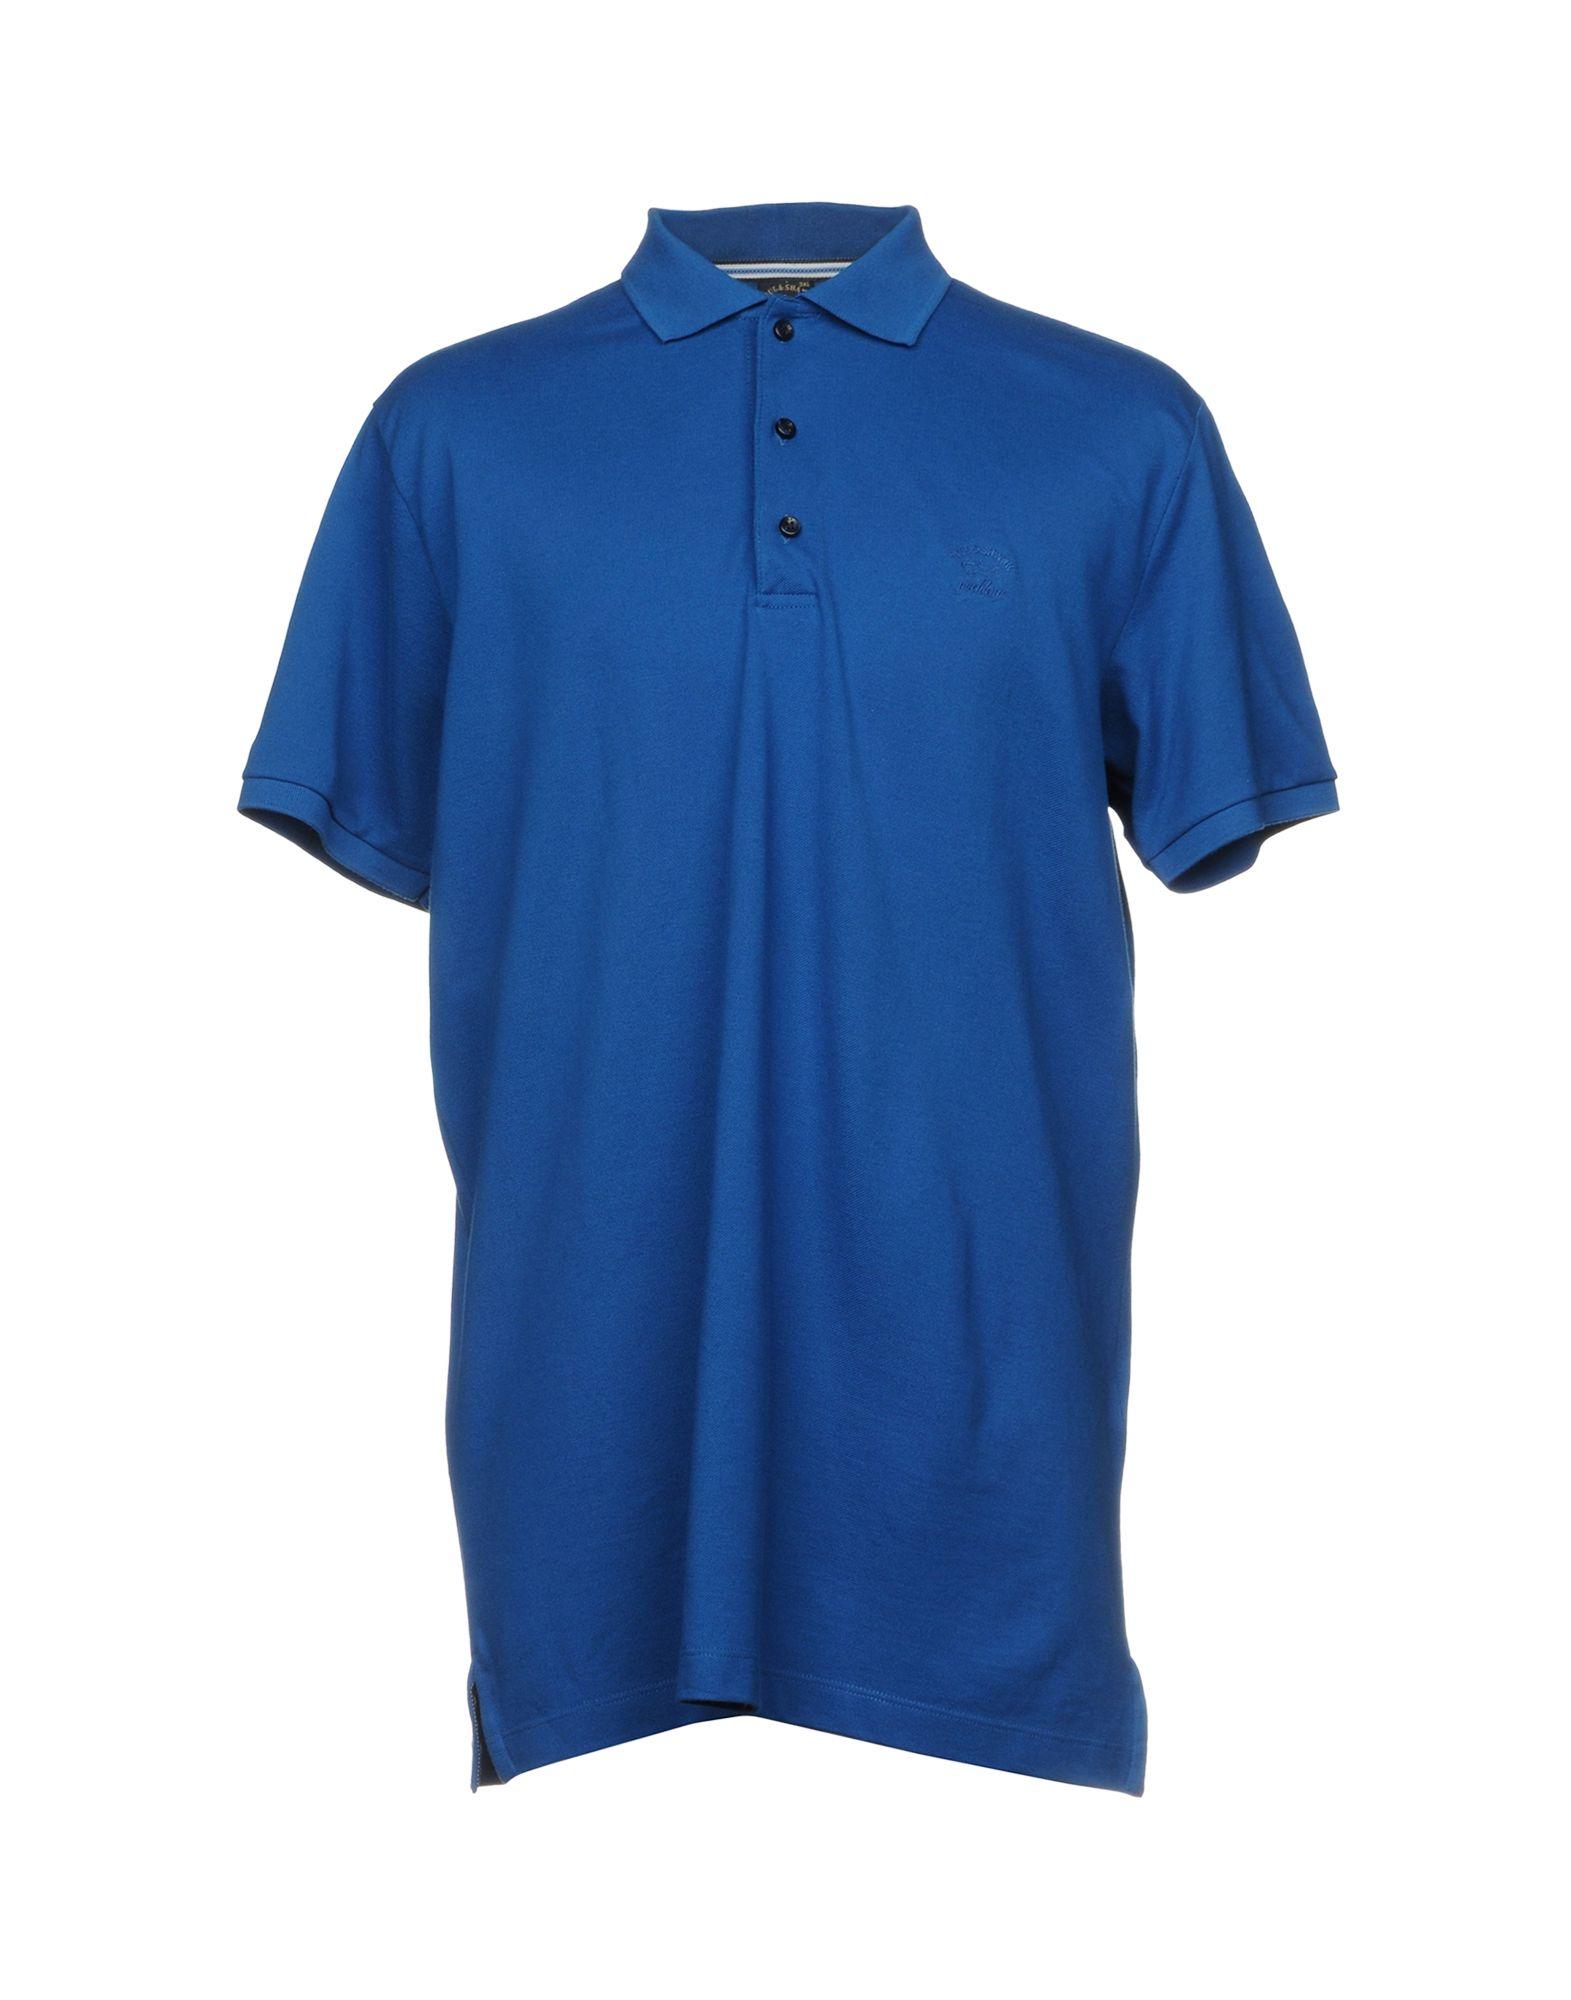 PAUL & SHARK Herren Poloshirt Farbe Blau Größe 9 - broschei